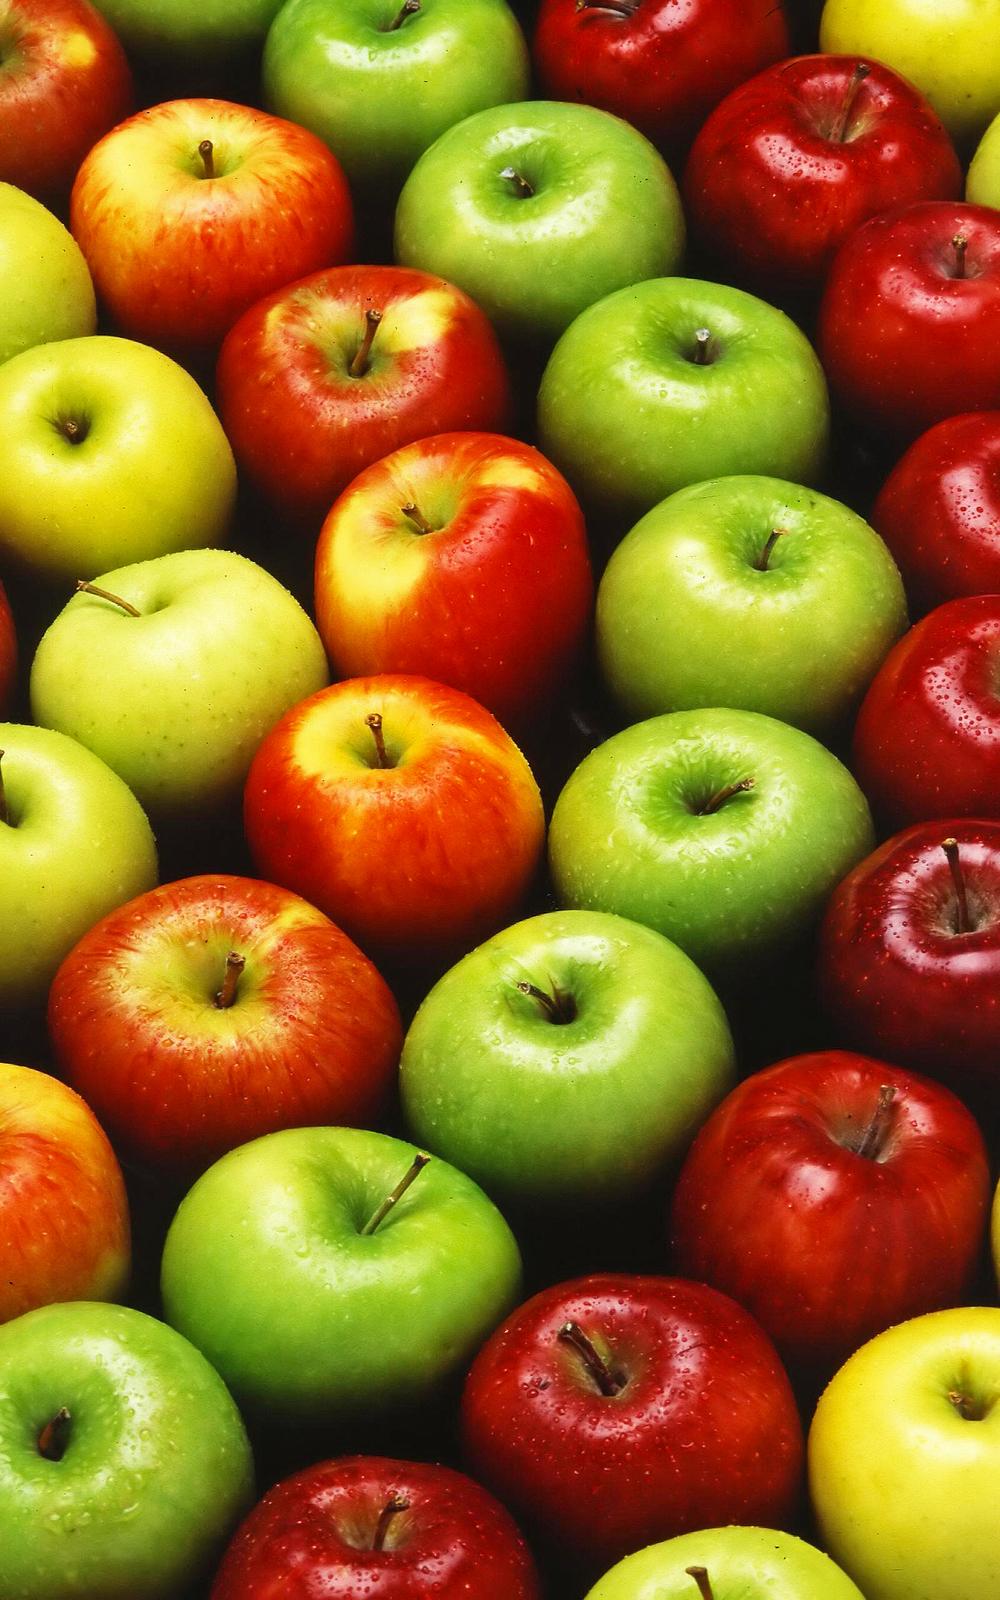 Apples33.jpg